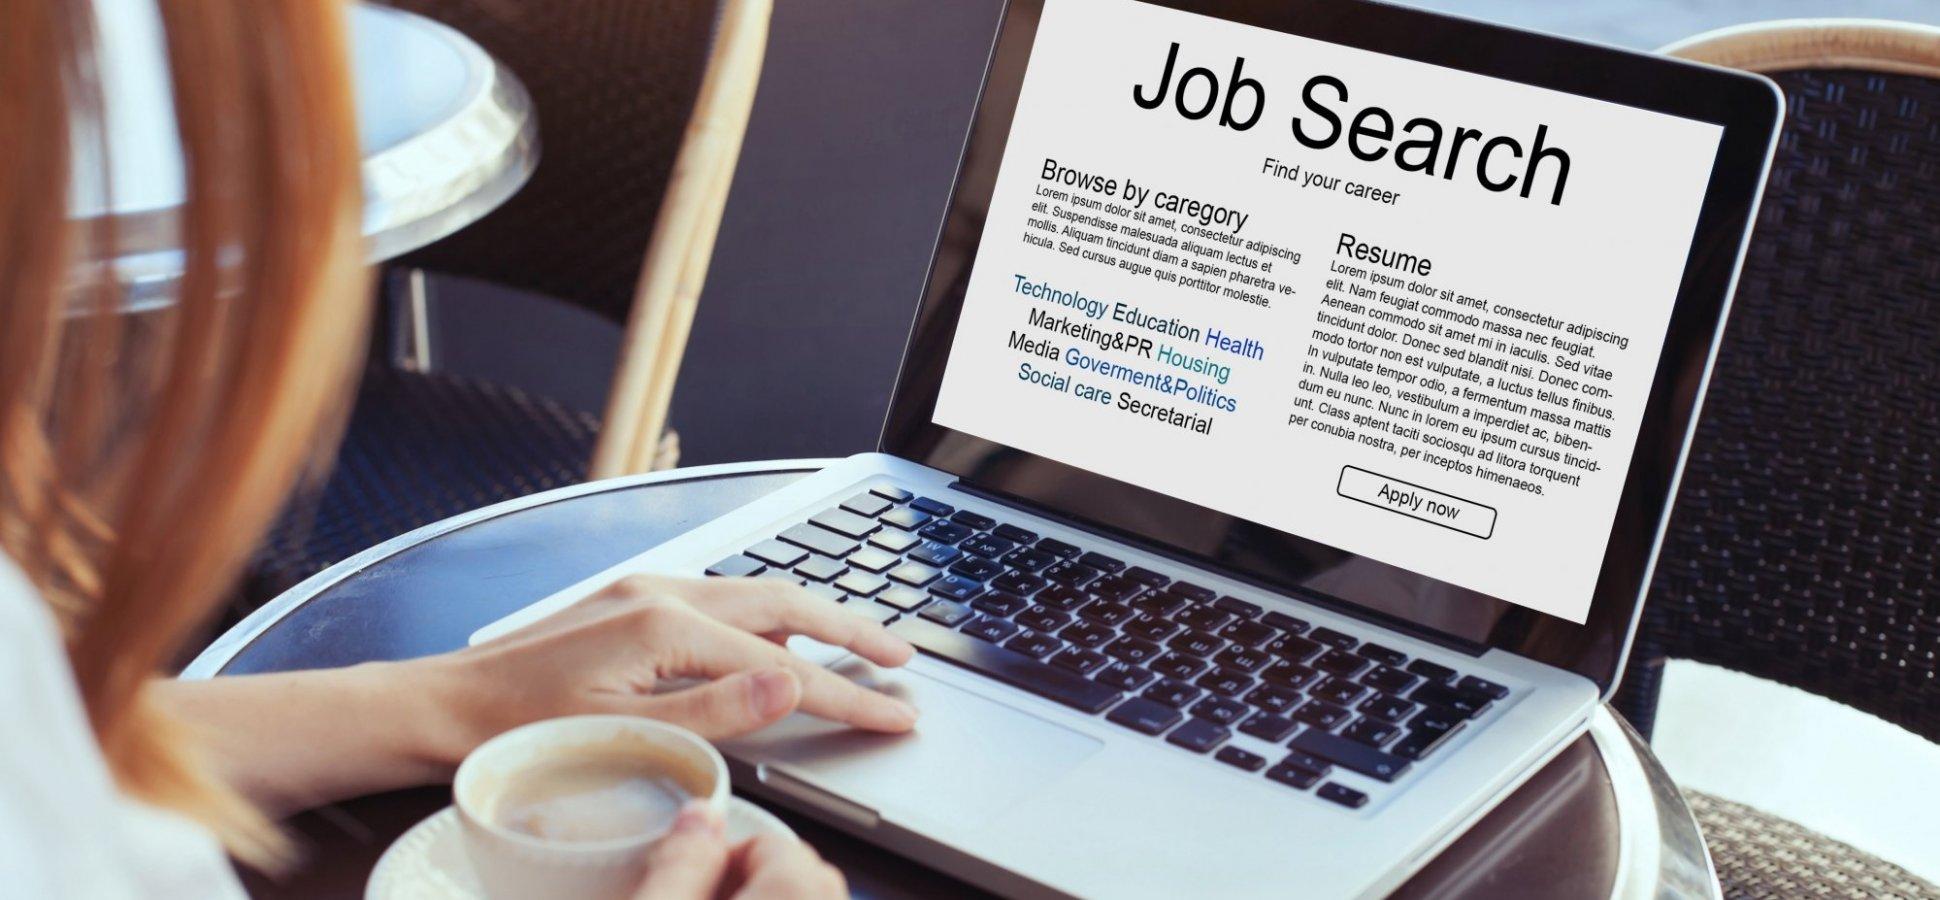 LinkedIn Reveals New Techniques to Get a Better Job